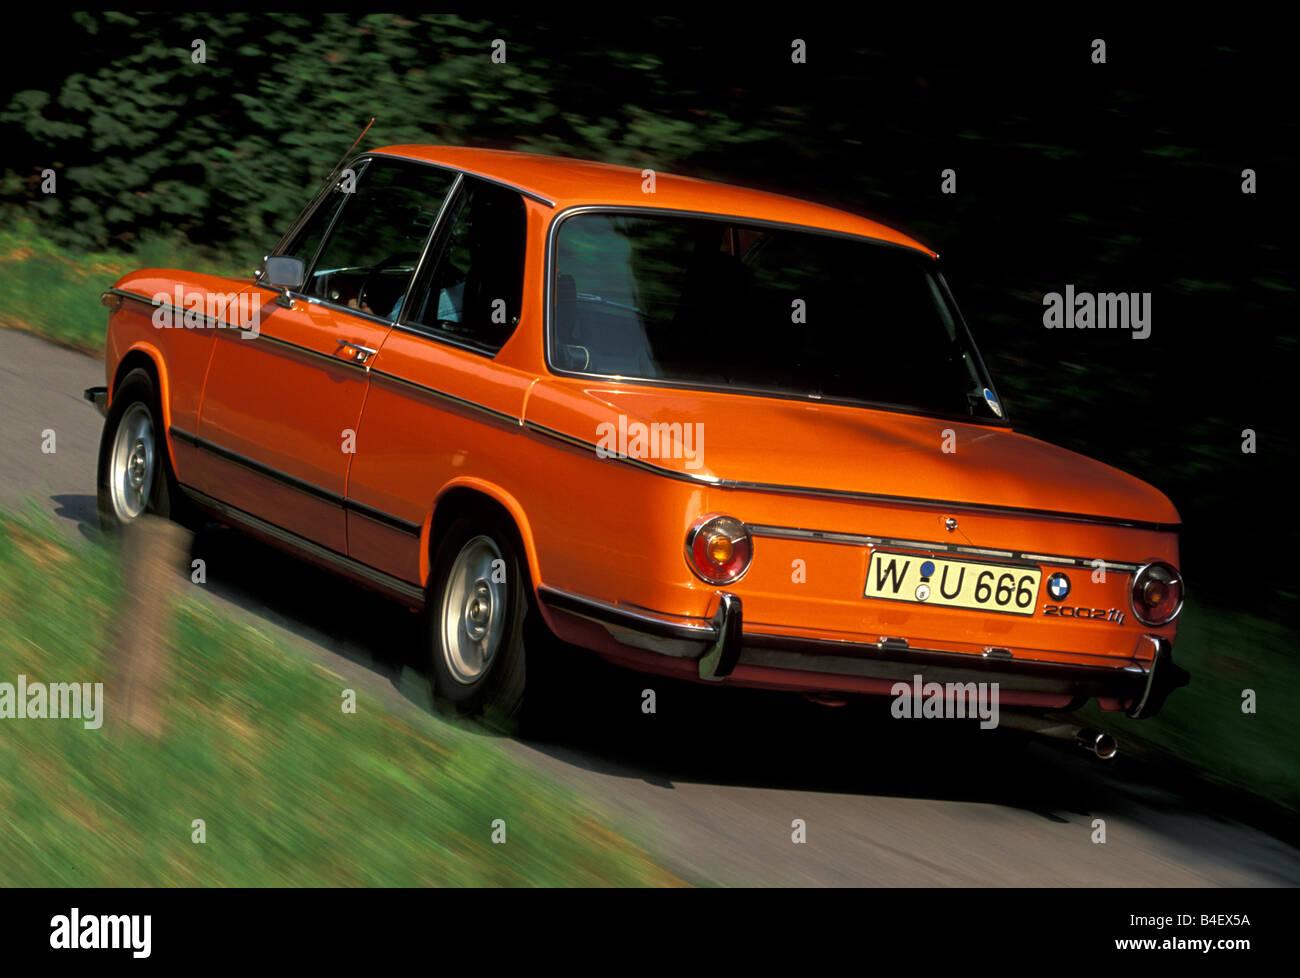 Car Bmw 2002 Tii Sedan Medium Class Medium Sized Vintage Car Stock Photo Alamy